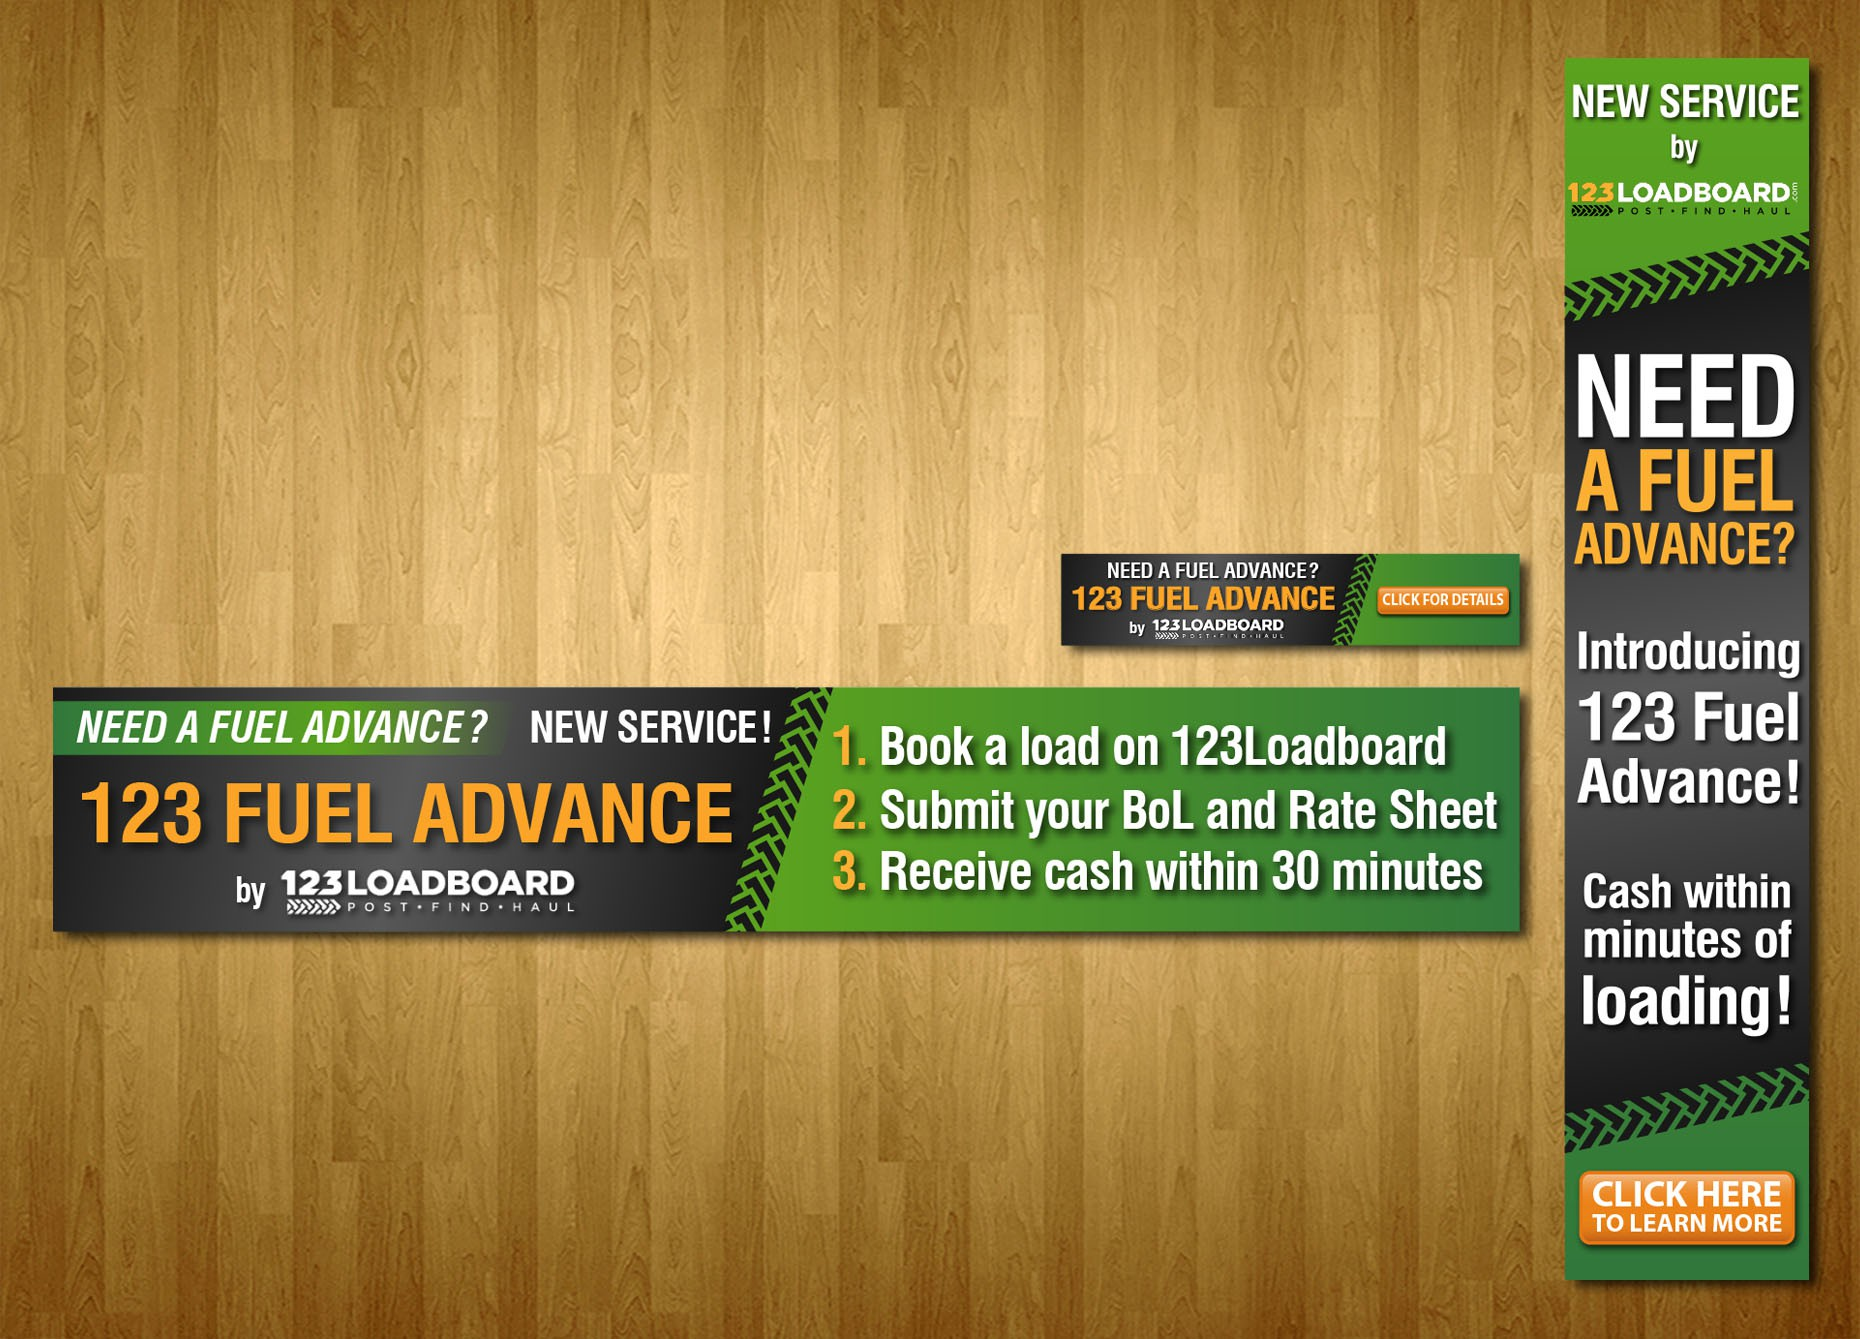 123 Fuel Advance